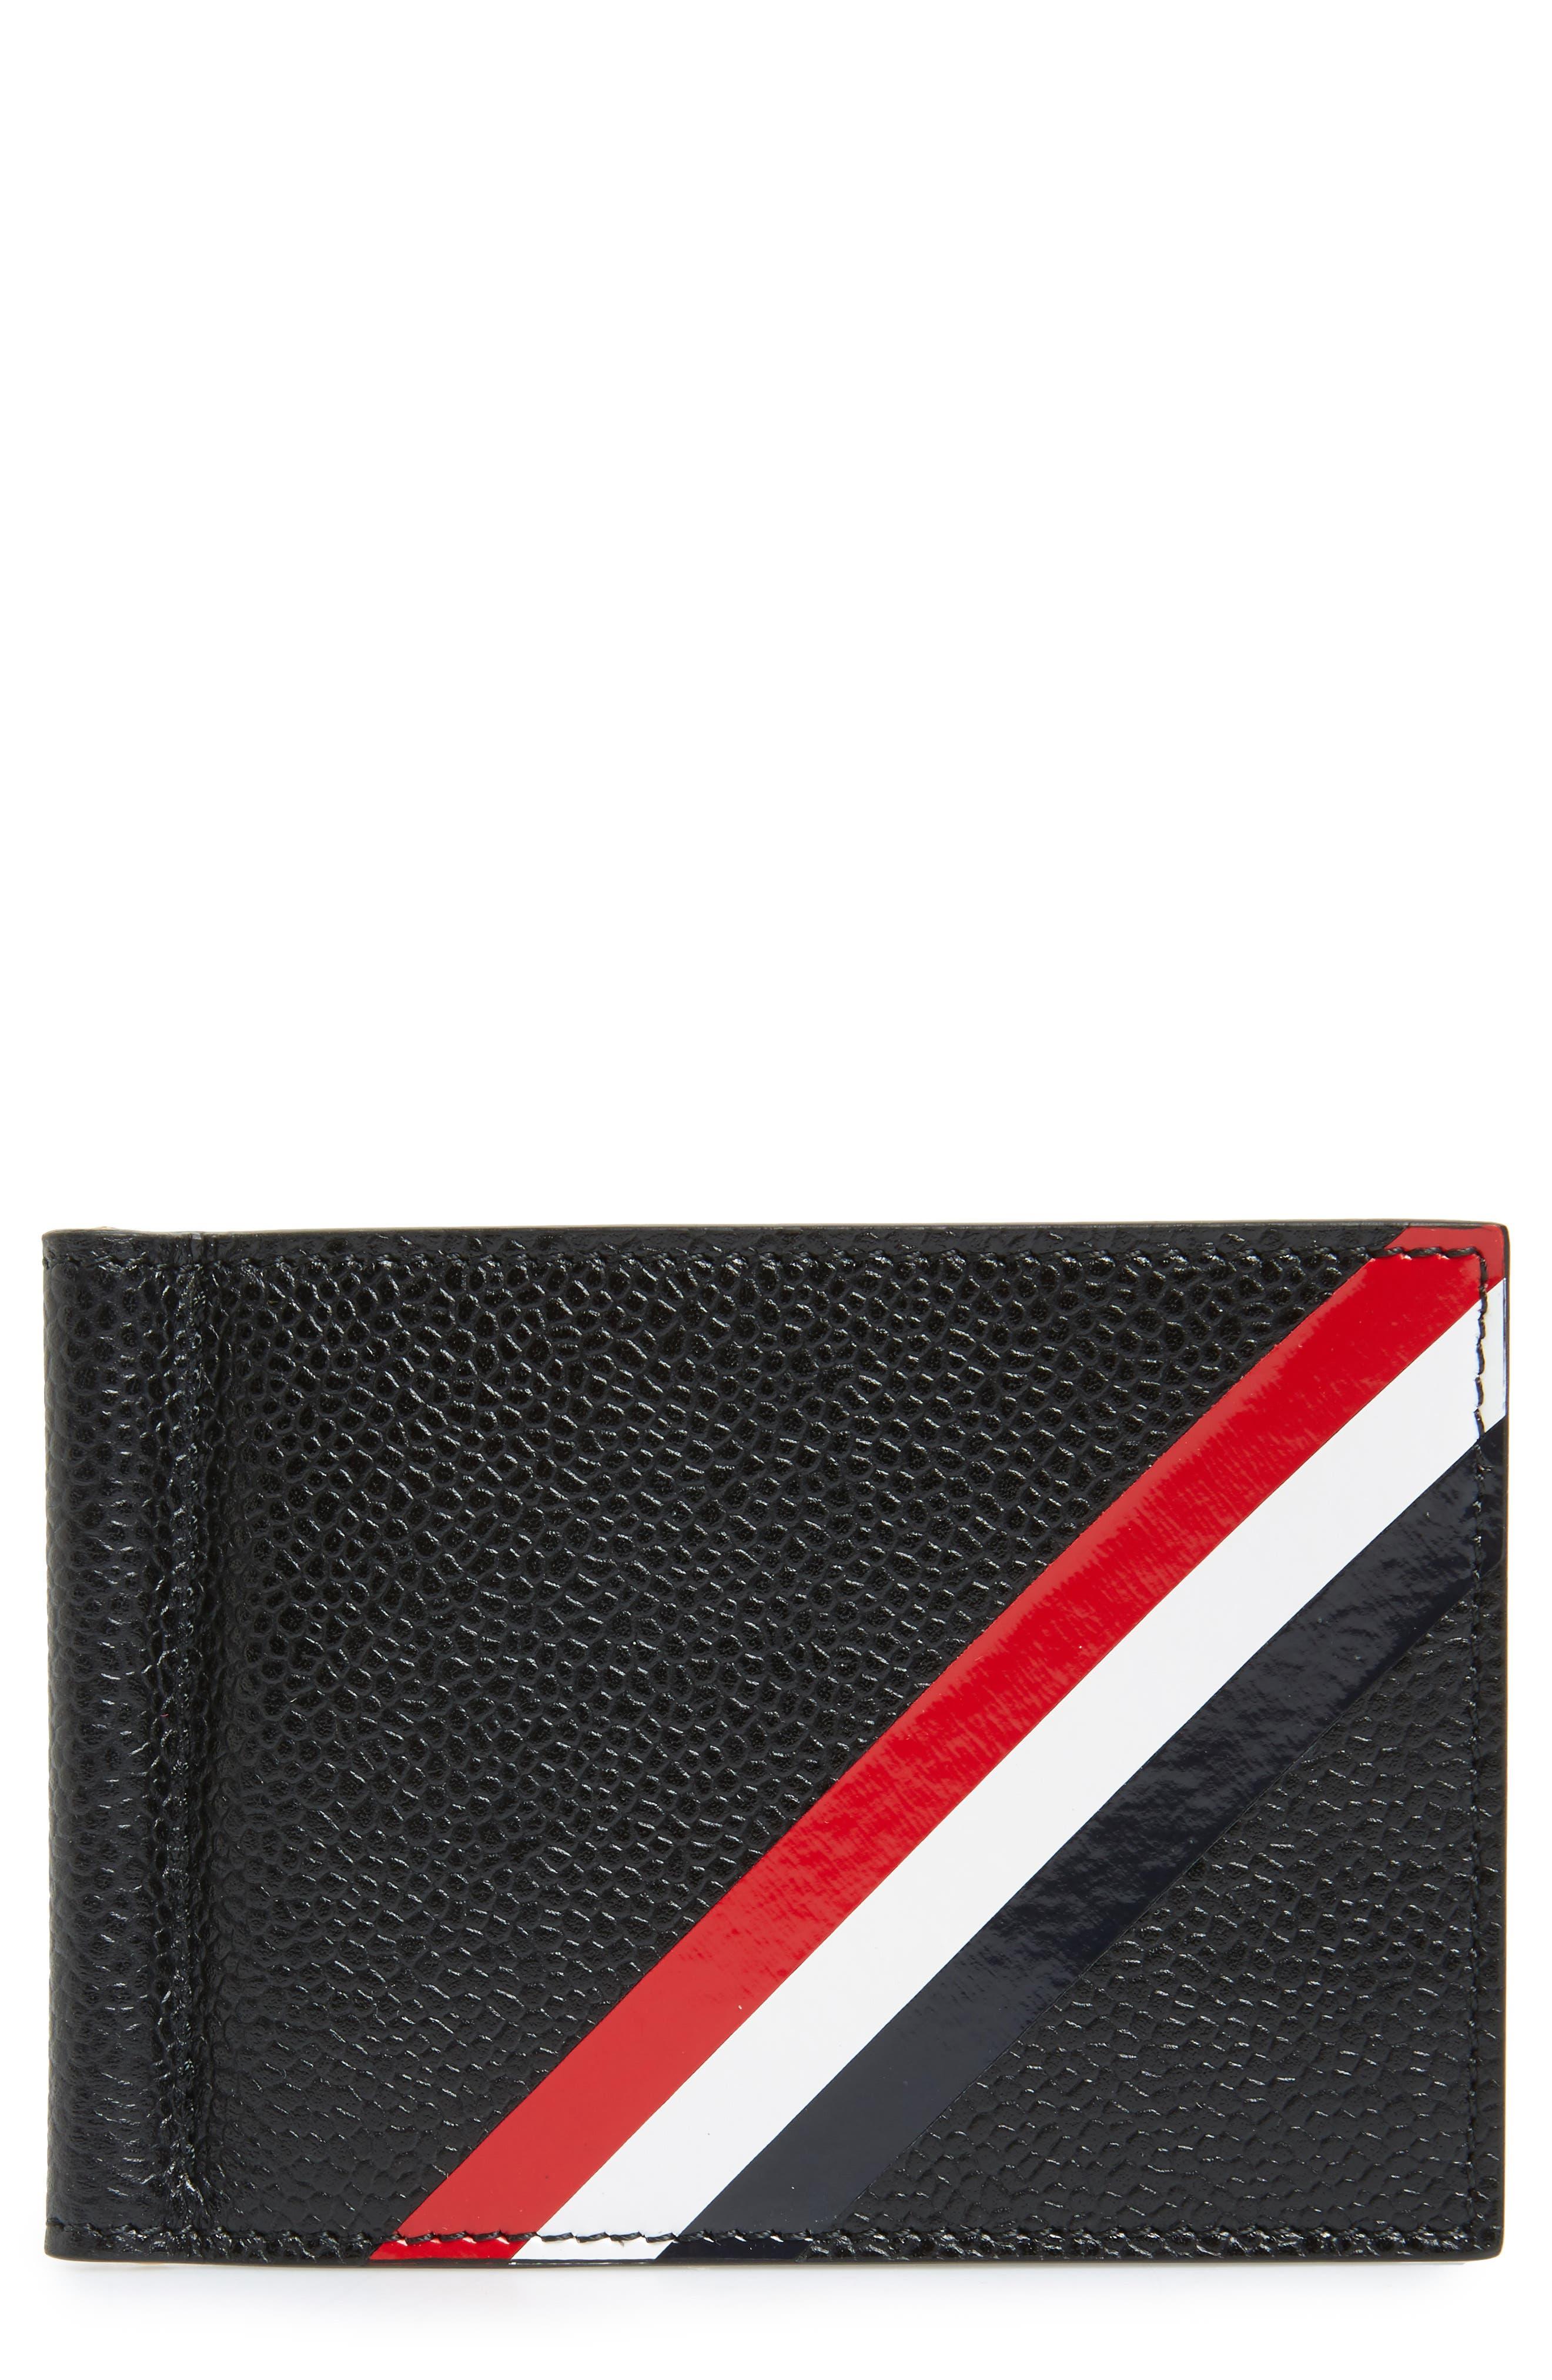 Thom Browne Diagonal Stripe Leather Card Holder